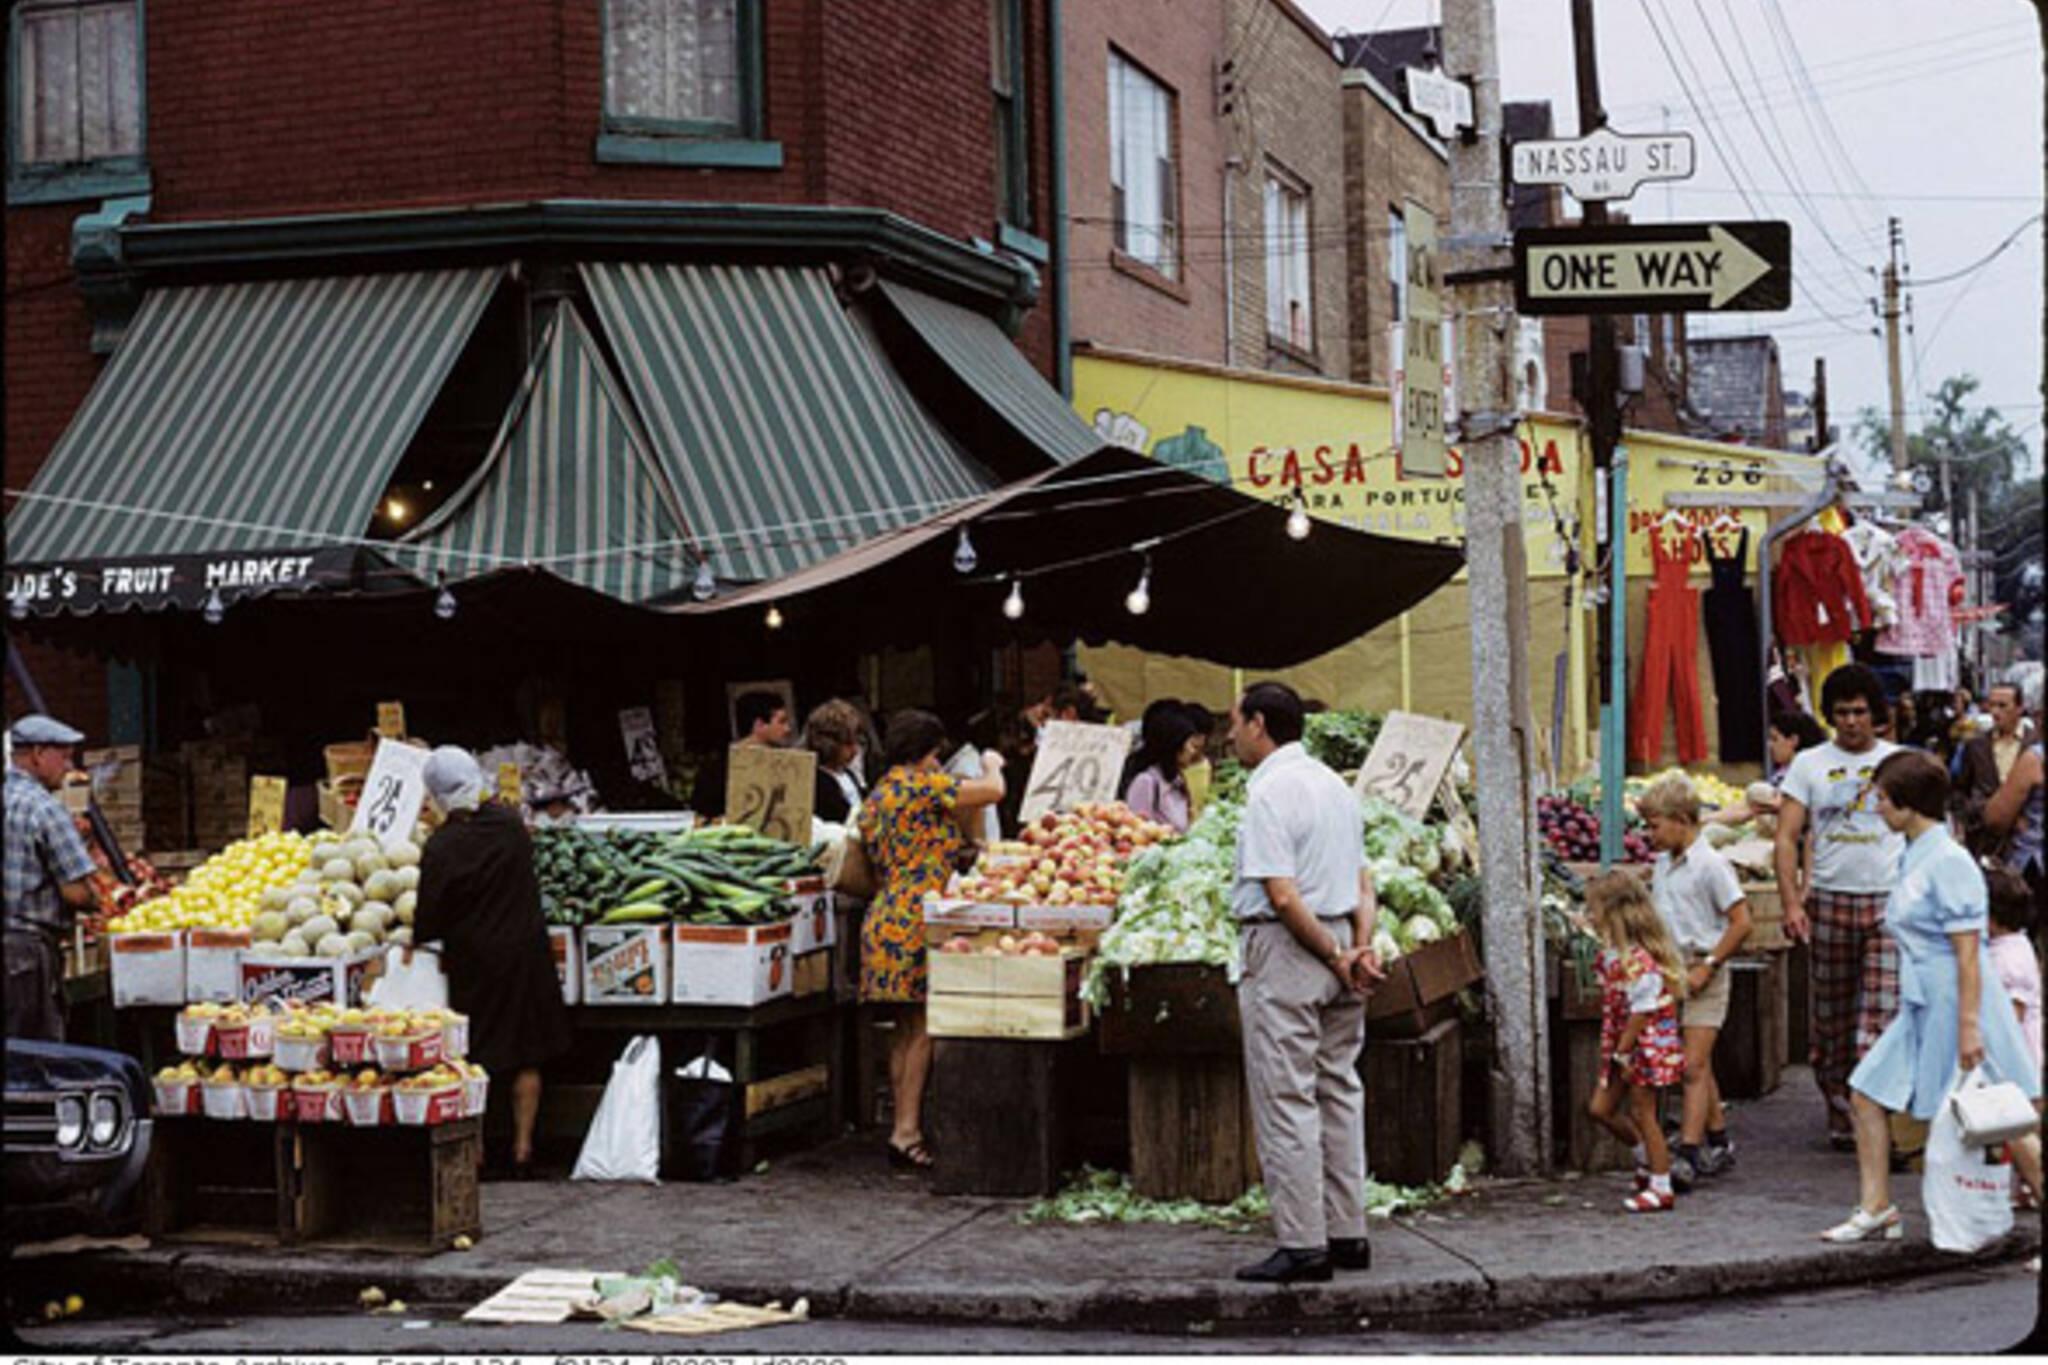 Kensington market History